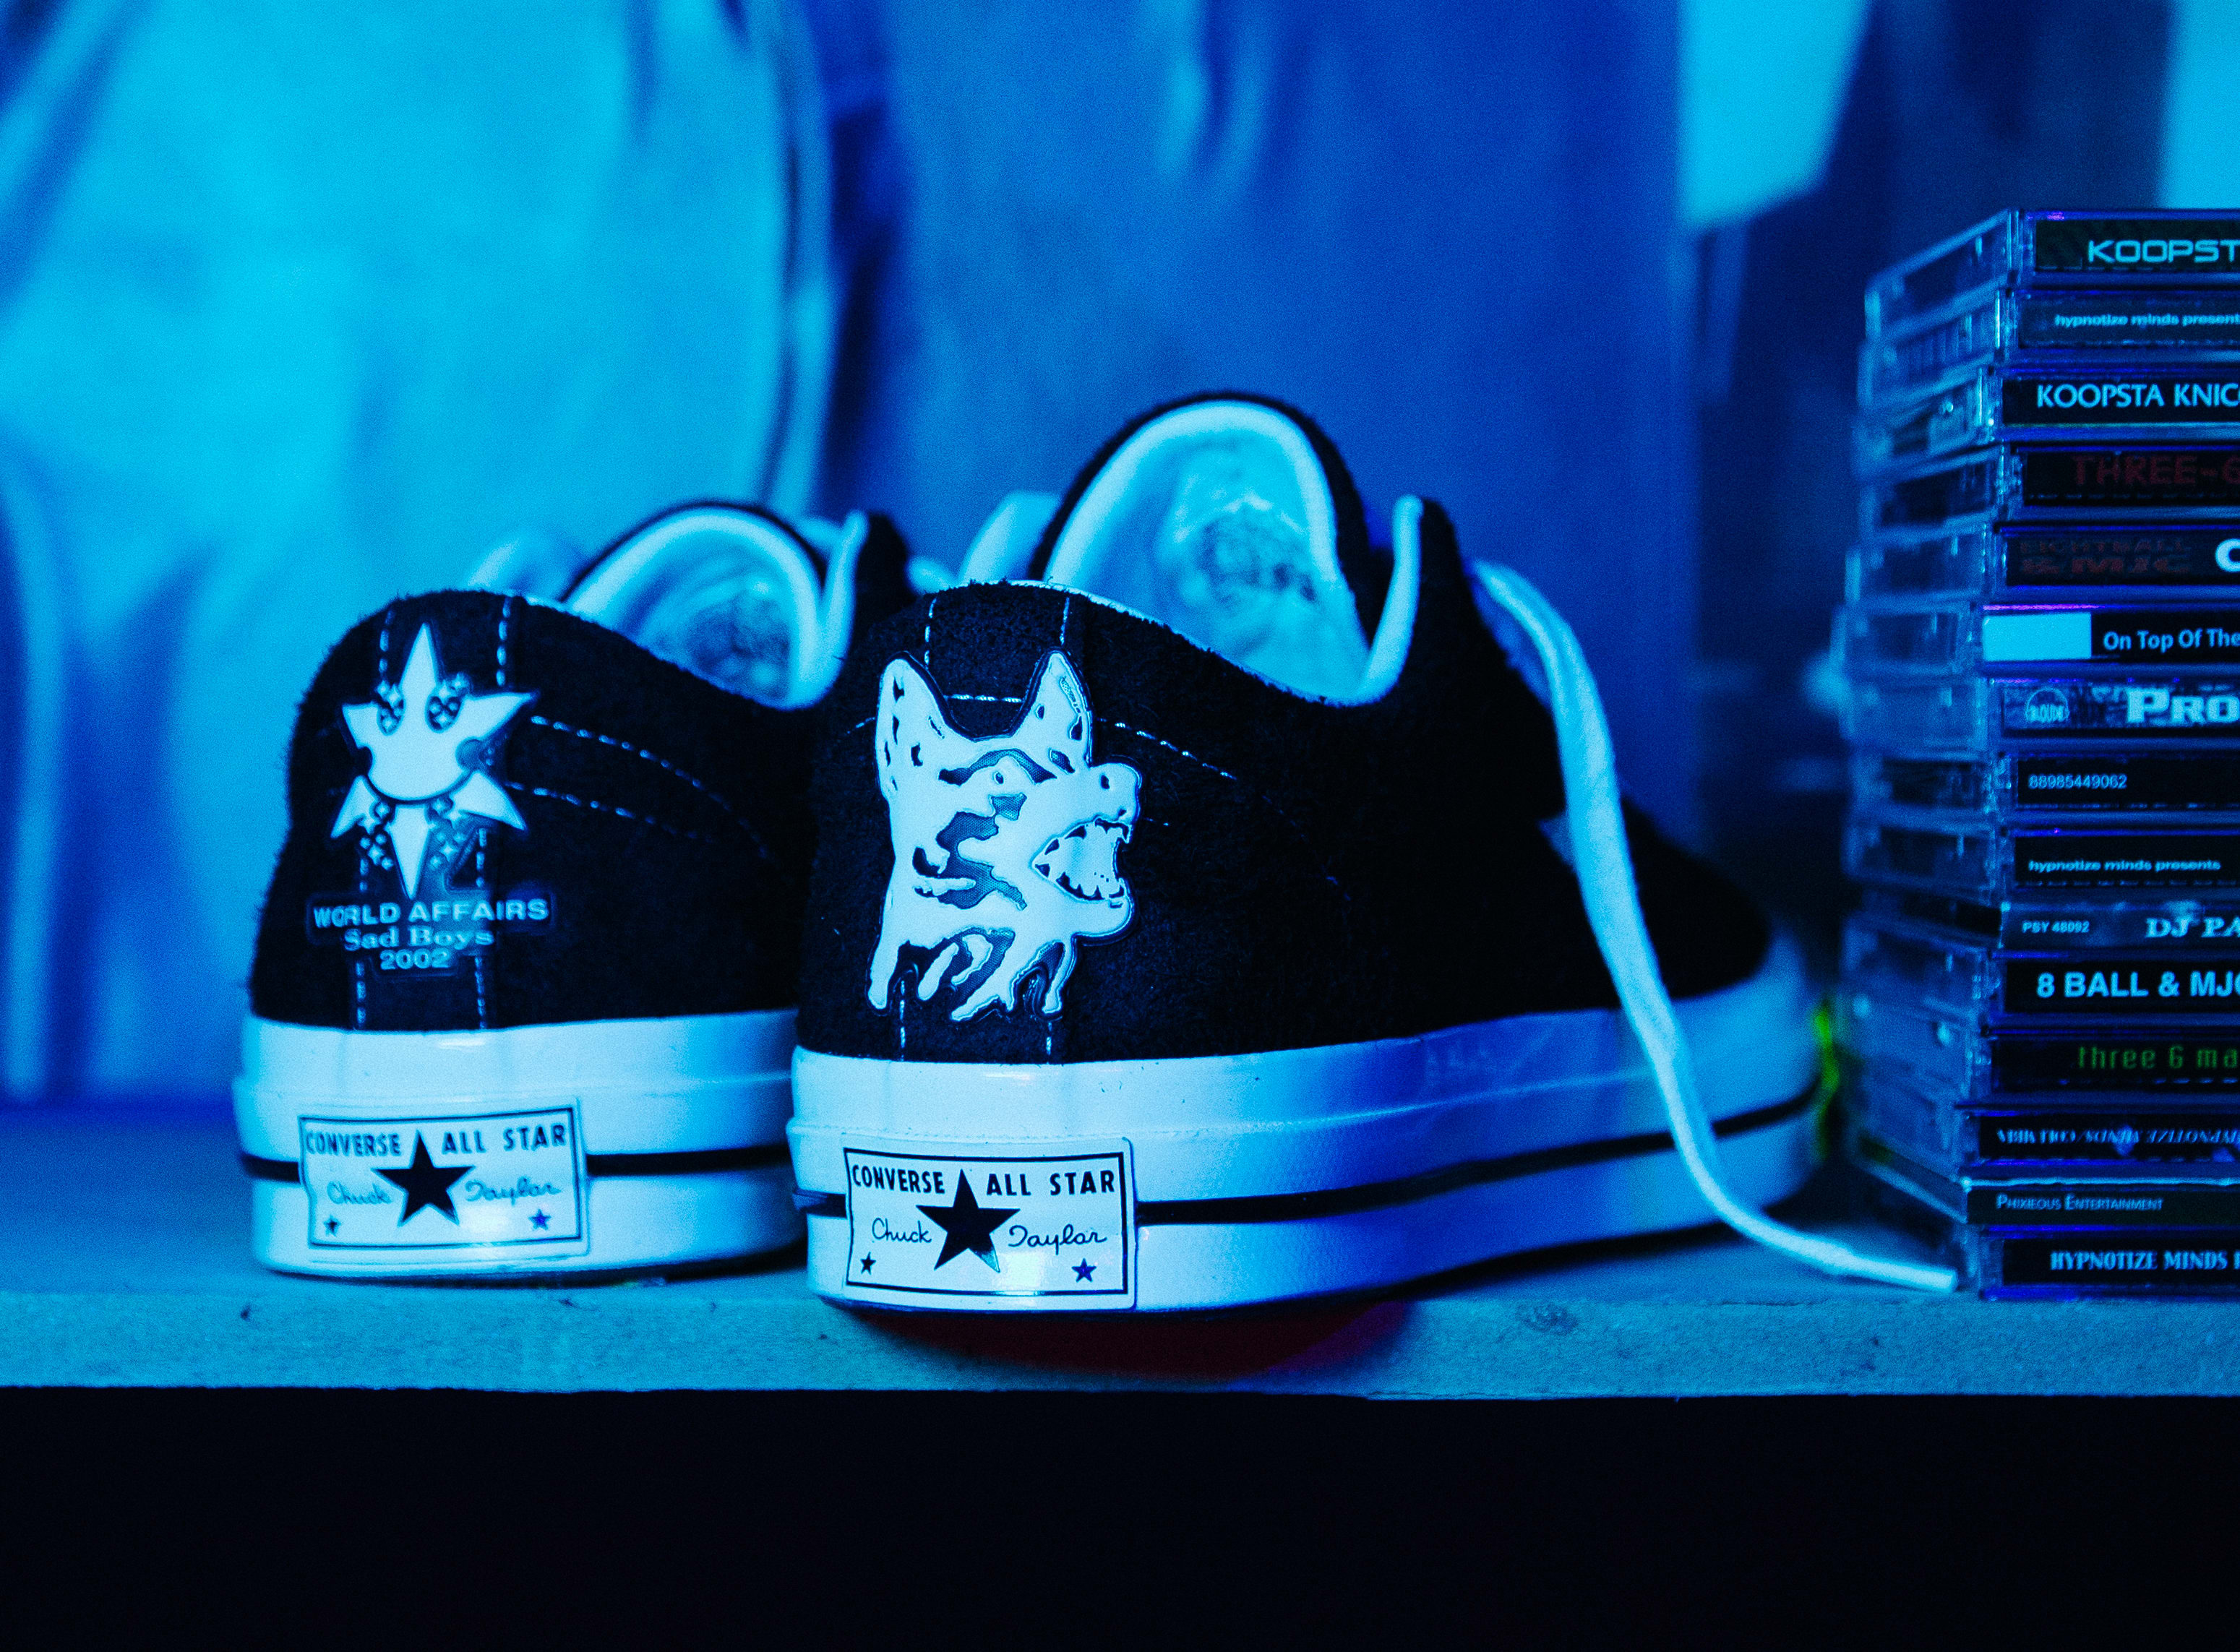 innowacyjny design buty skate ujęcia stóp Yung Leanが「One Star Hotel」にてコンバースとの ...